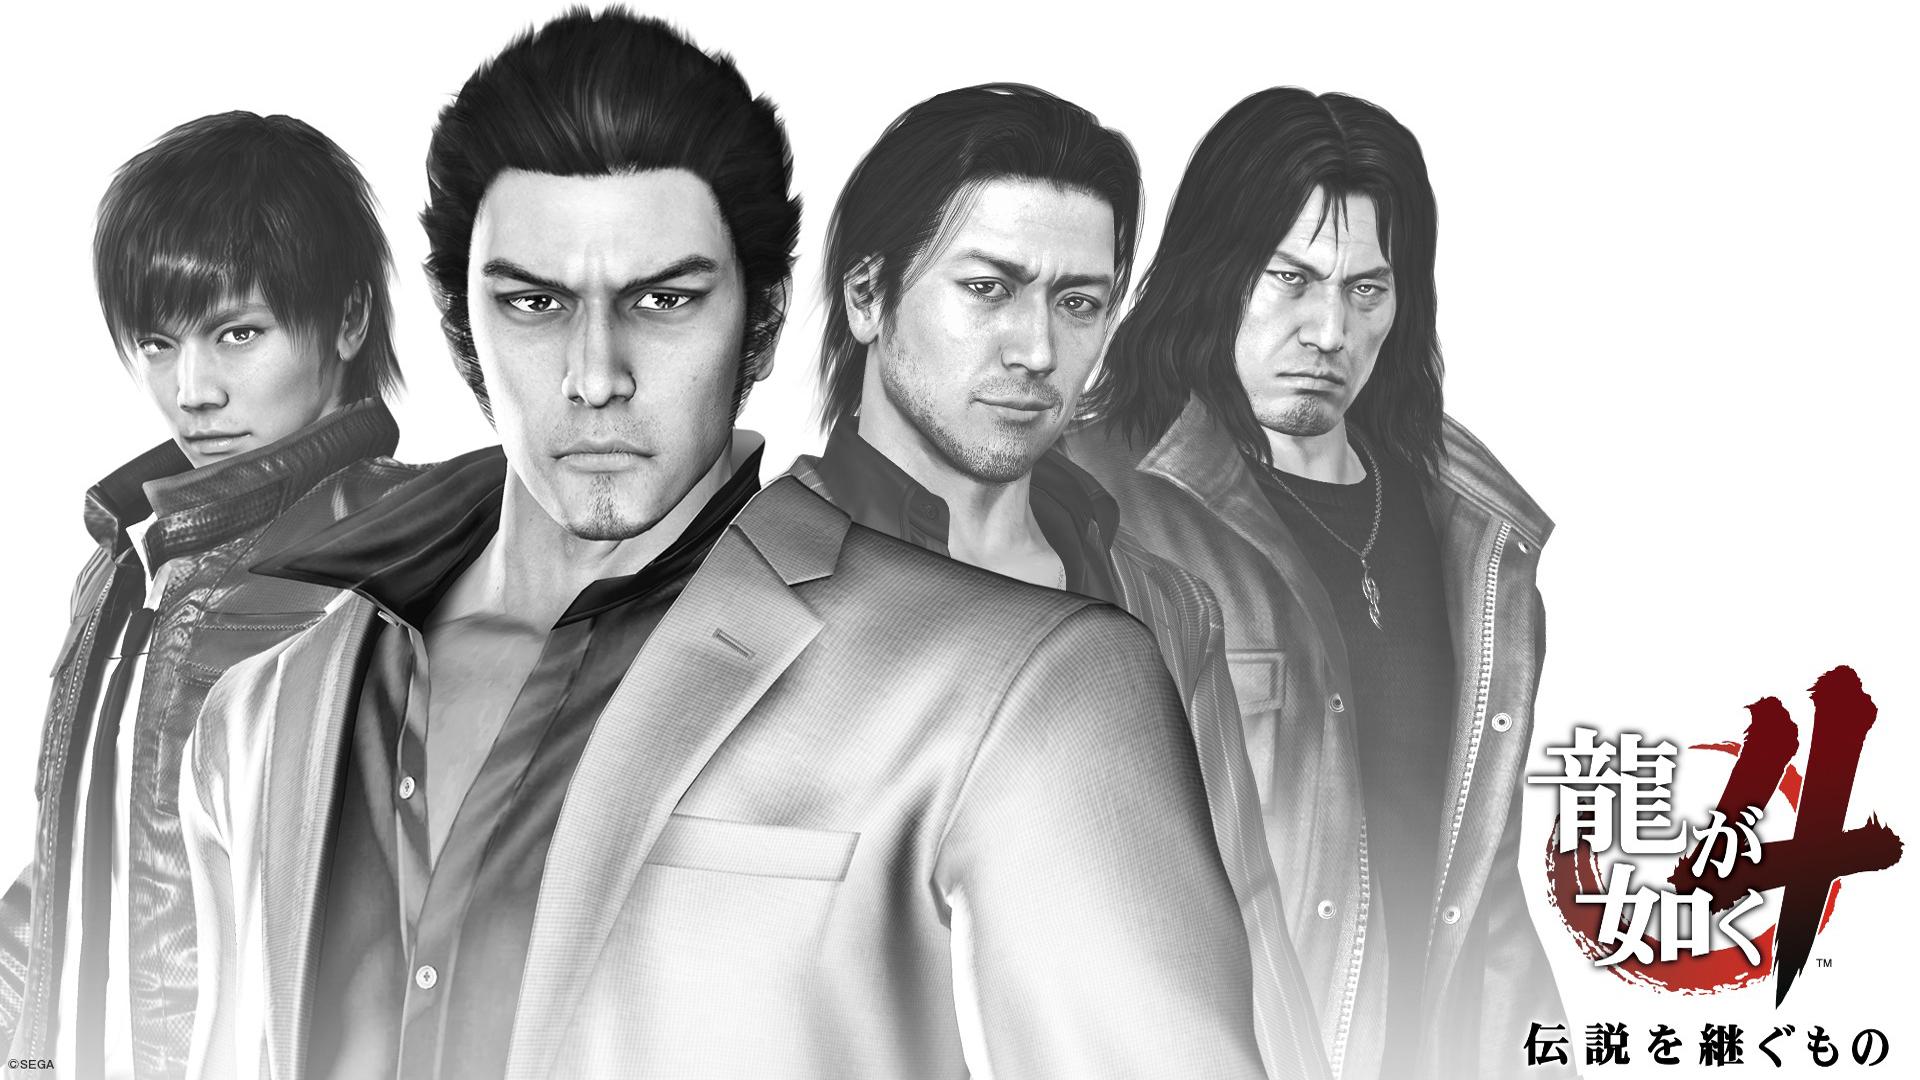 Yakuza 4 Wallpapers Video Game Hq Yakuza 4 Pictures 4k Wallpapers 2019